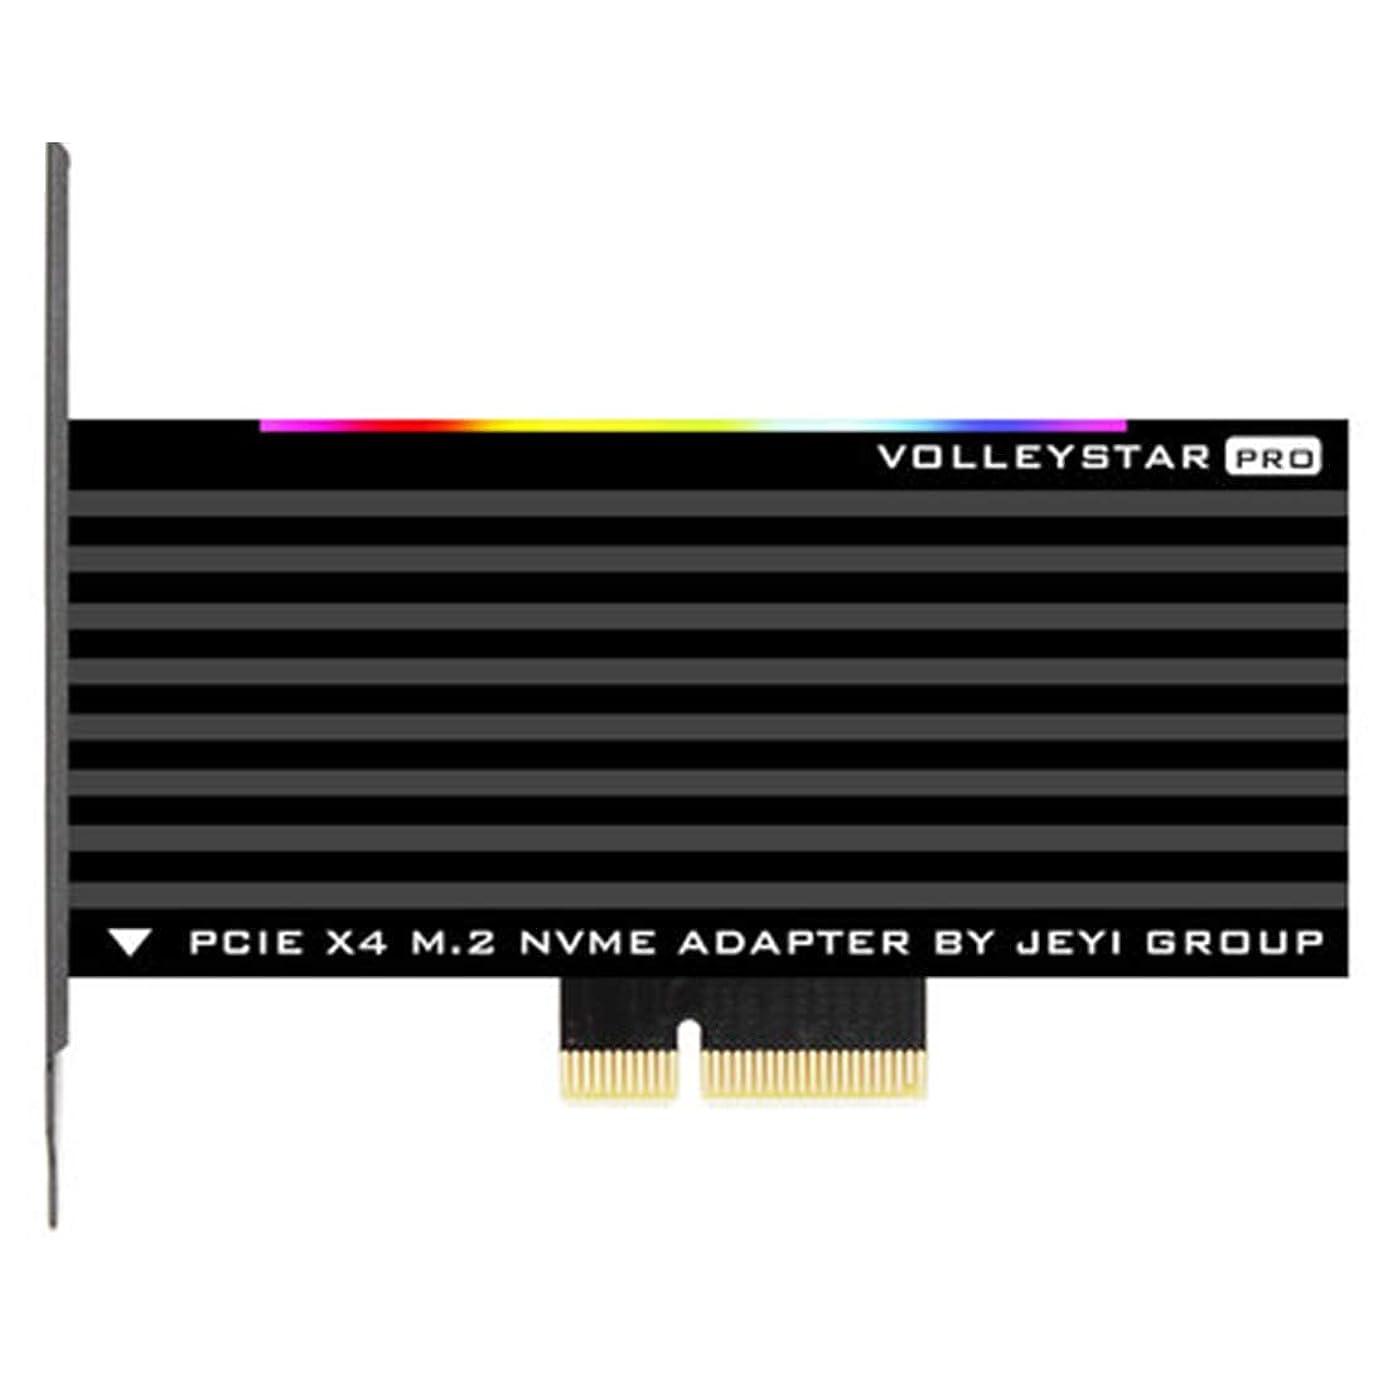 JEYI VolleyStar-PRO Black Heat Sink Heatsink M.2 NVMe SSD NGFF to PCIE X4 Adapter MKey Port Card PCI-E 3.0 x4 Full Speed RGB LED (Black)